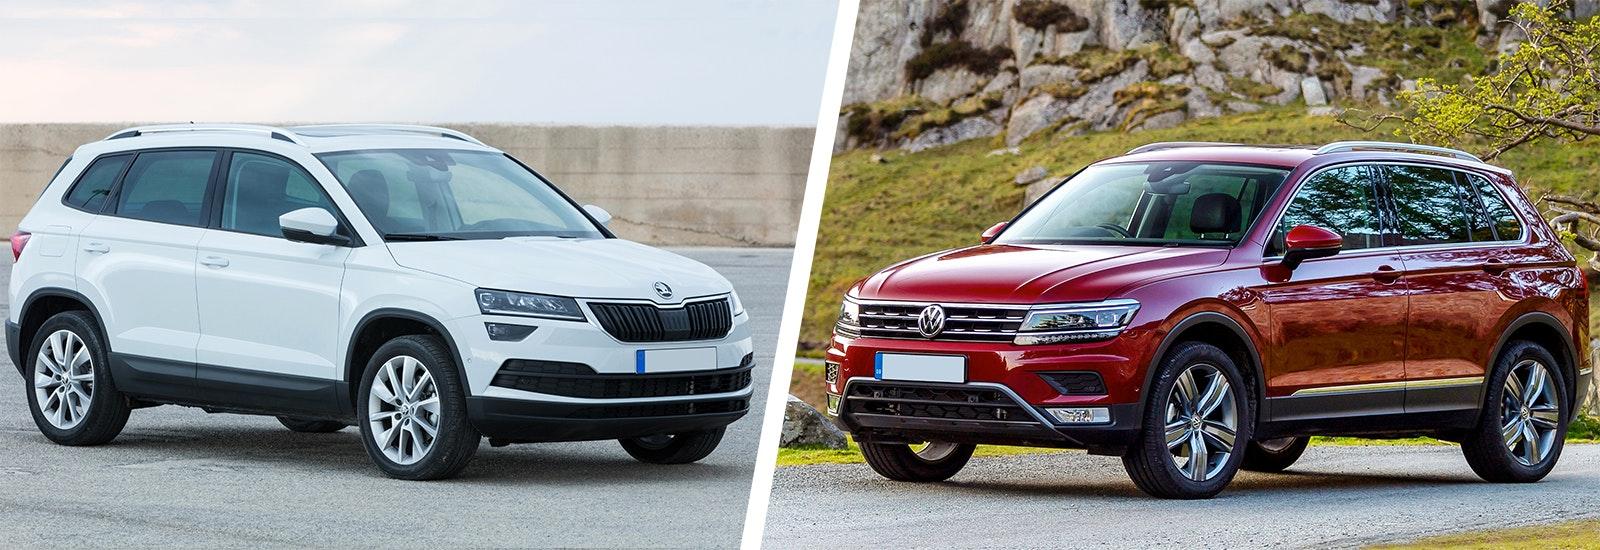 Skoda Karoq vs VW Tiguan – which is best